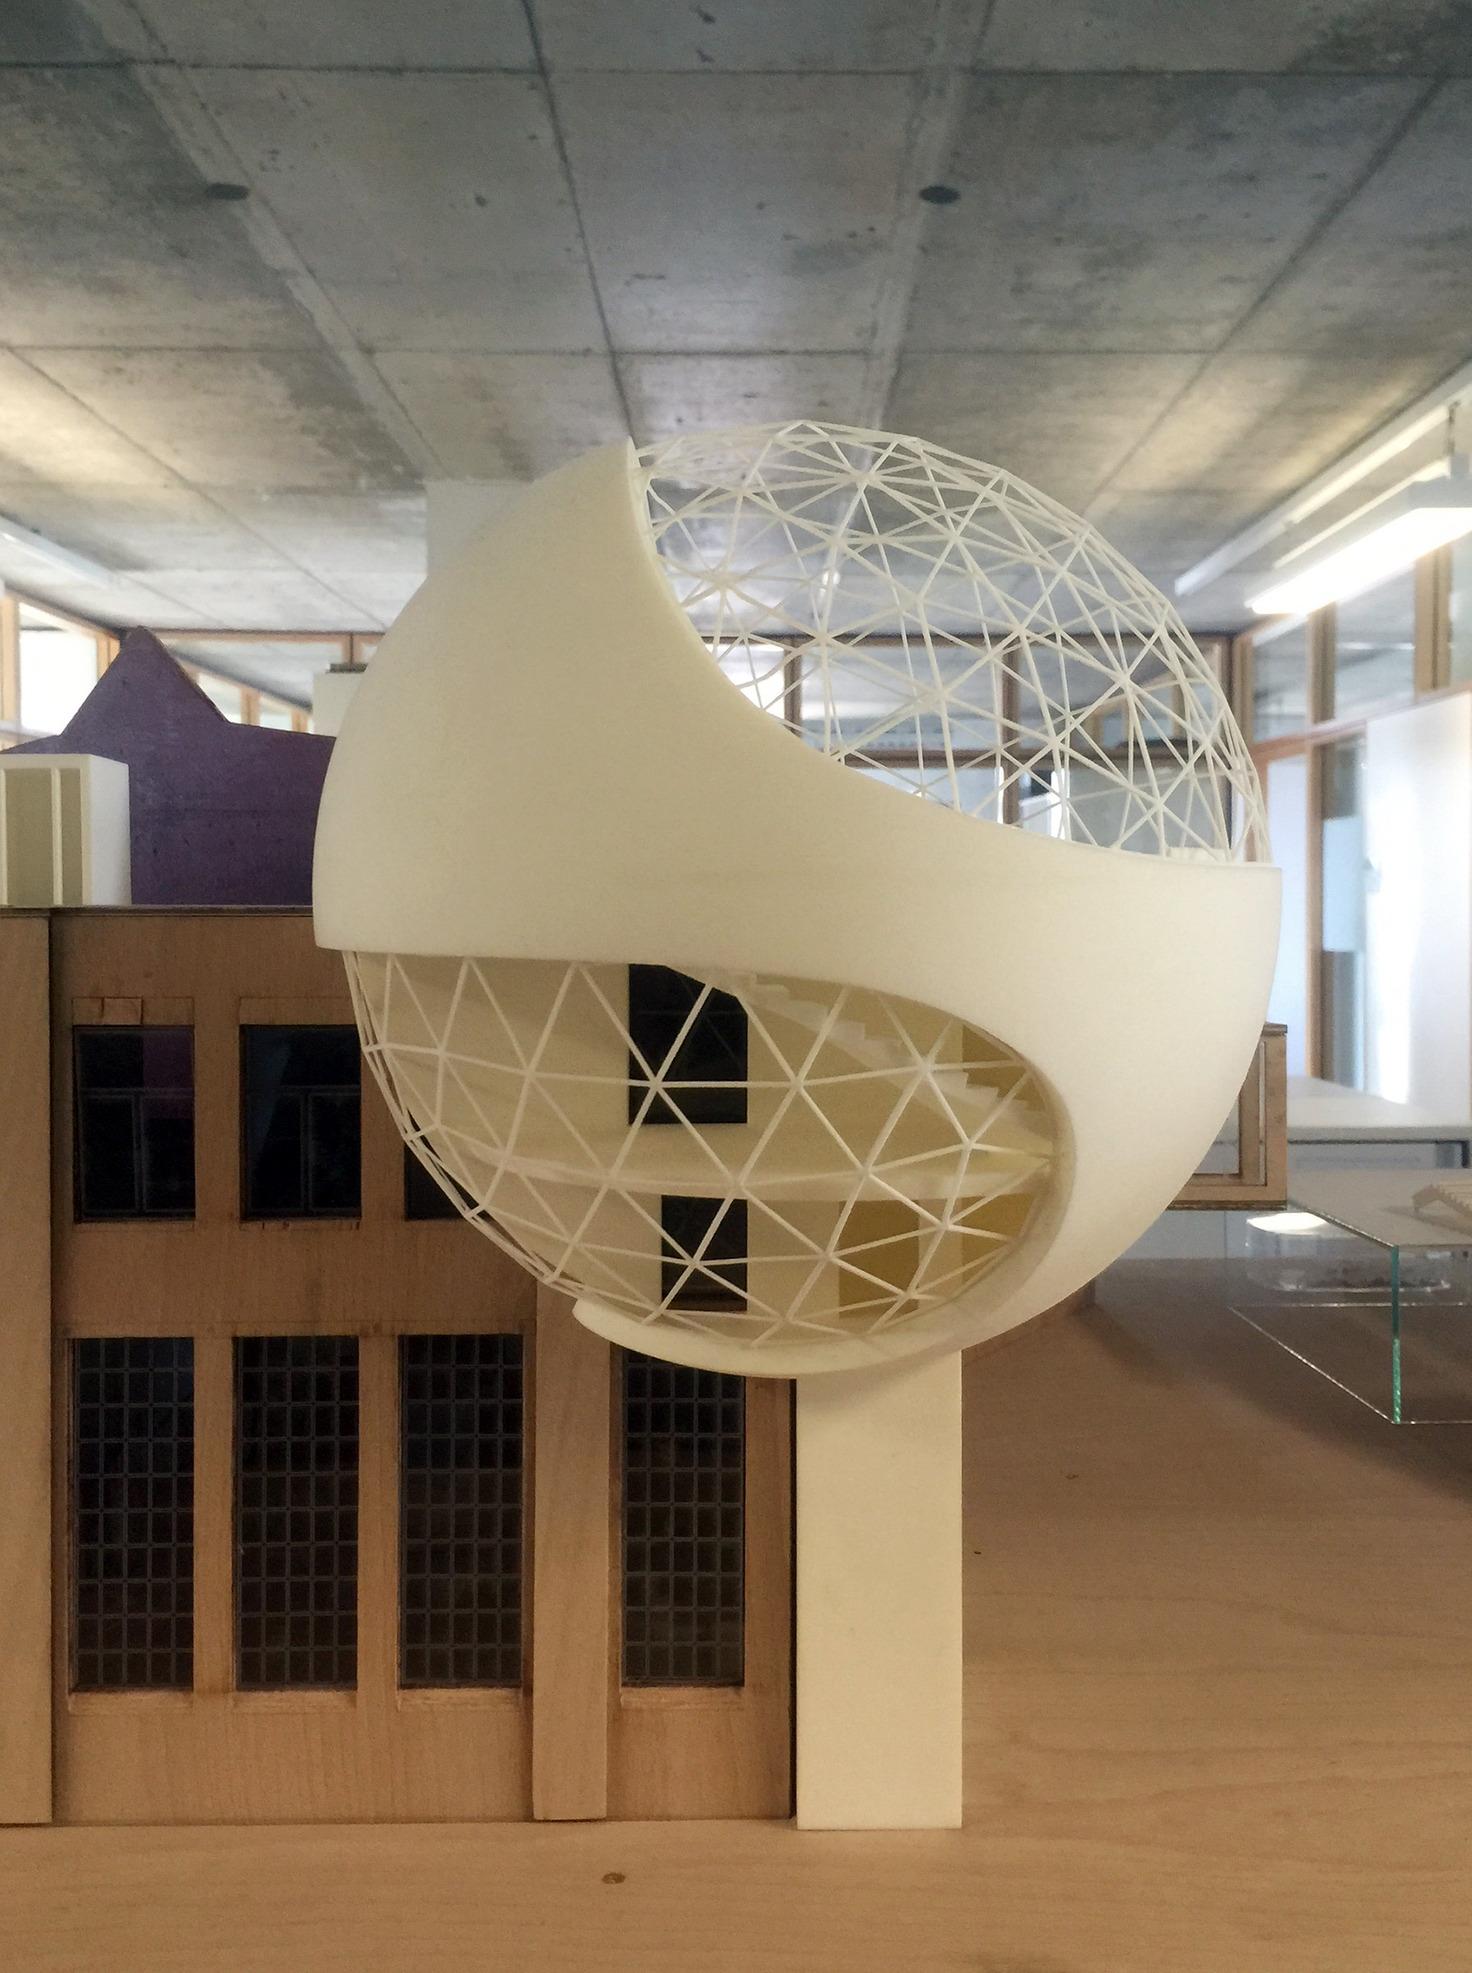 Late Work By Oscar Niemeyer Will Be Built In Leipzig